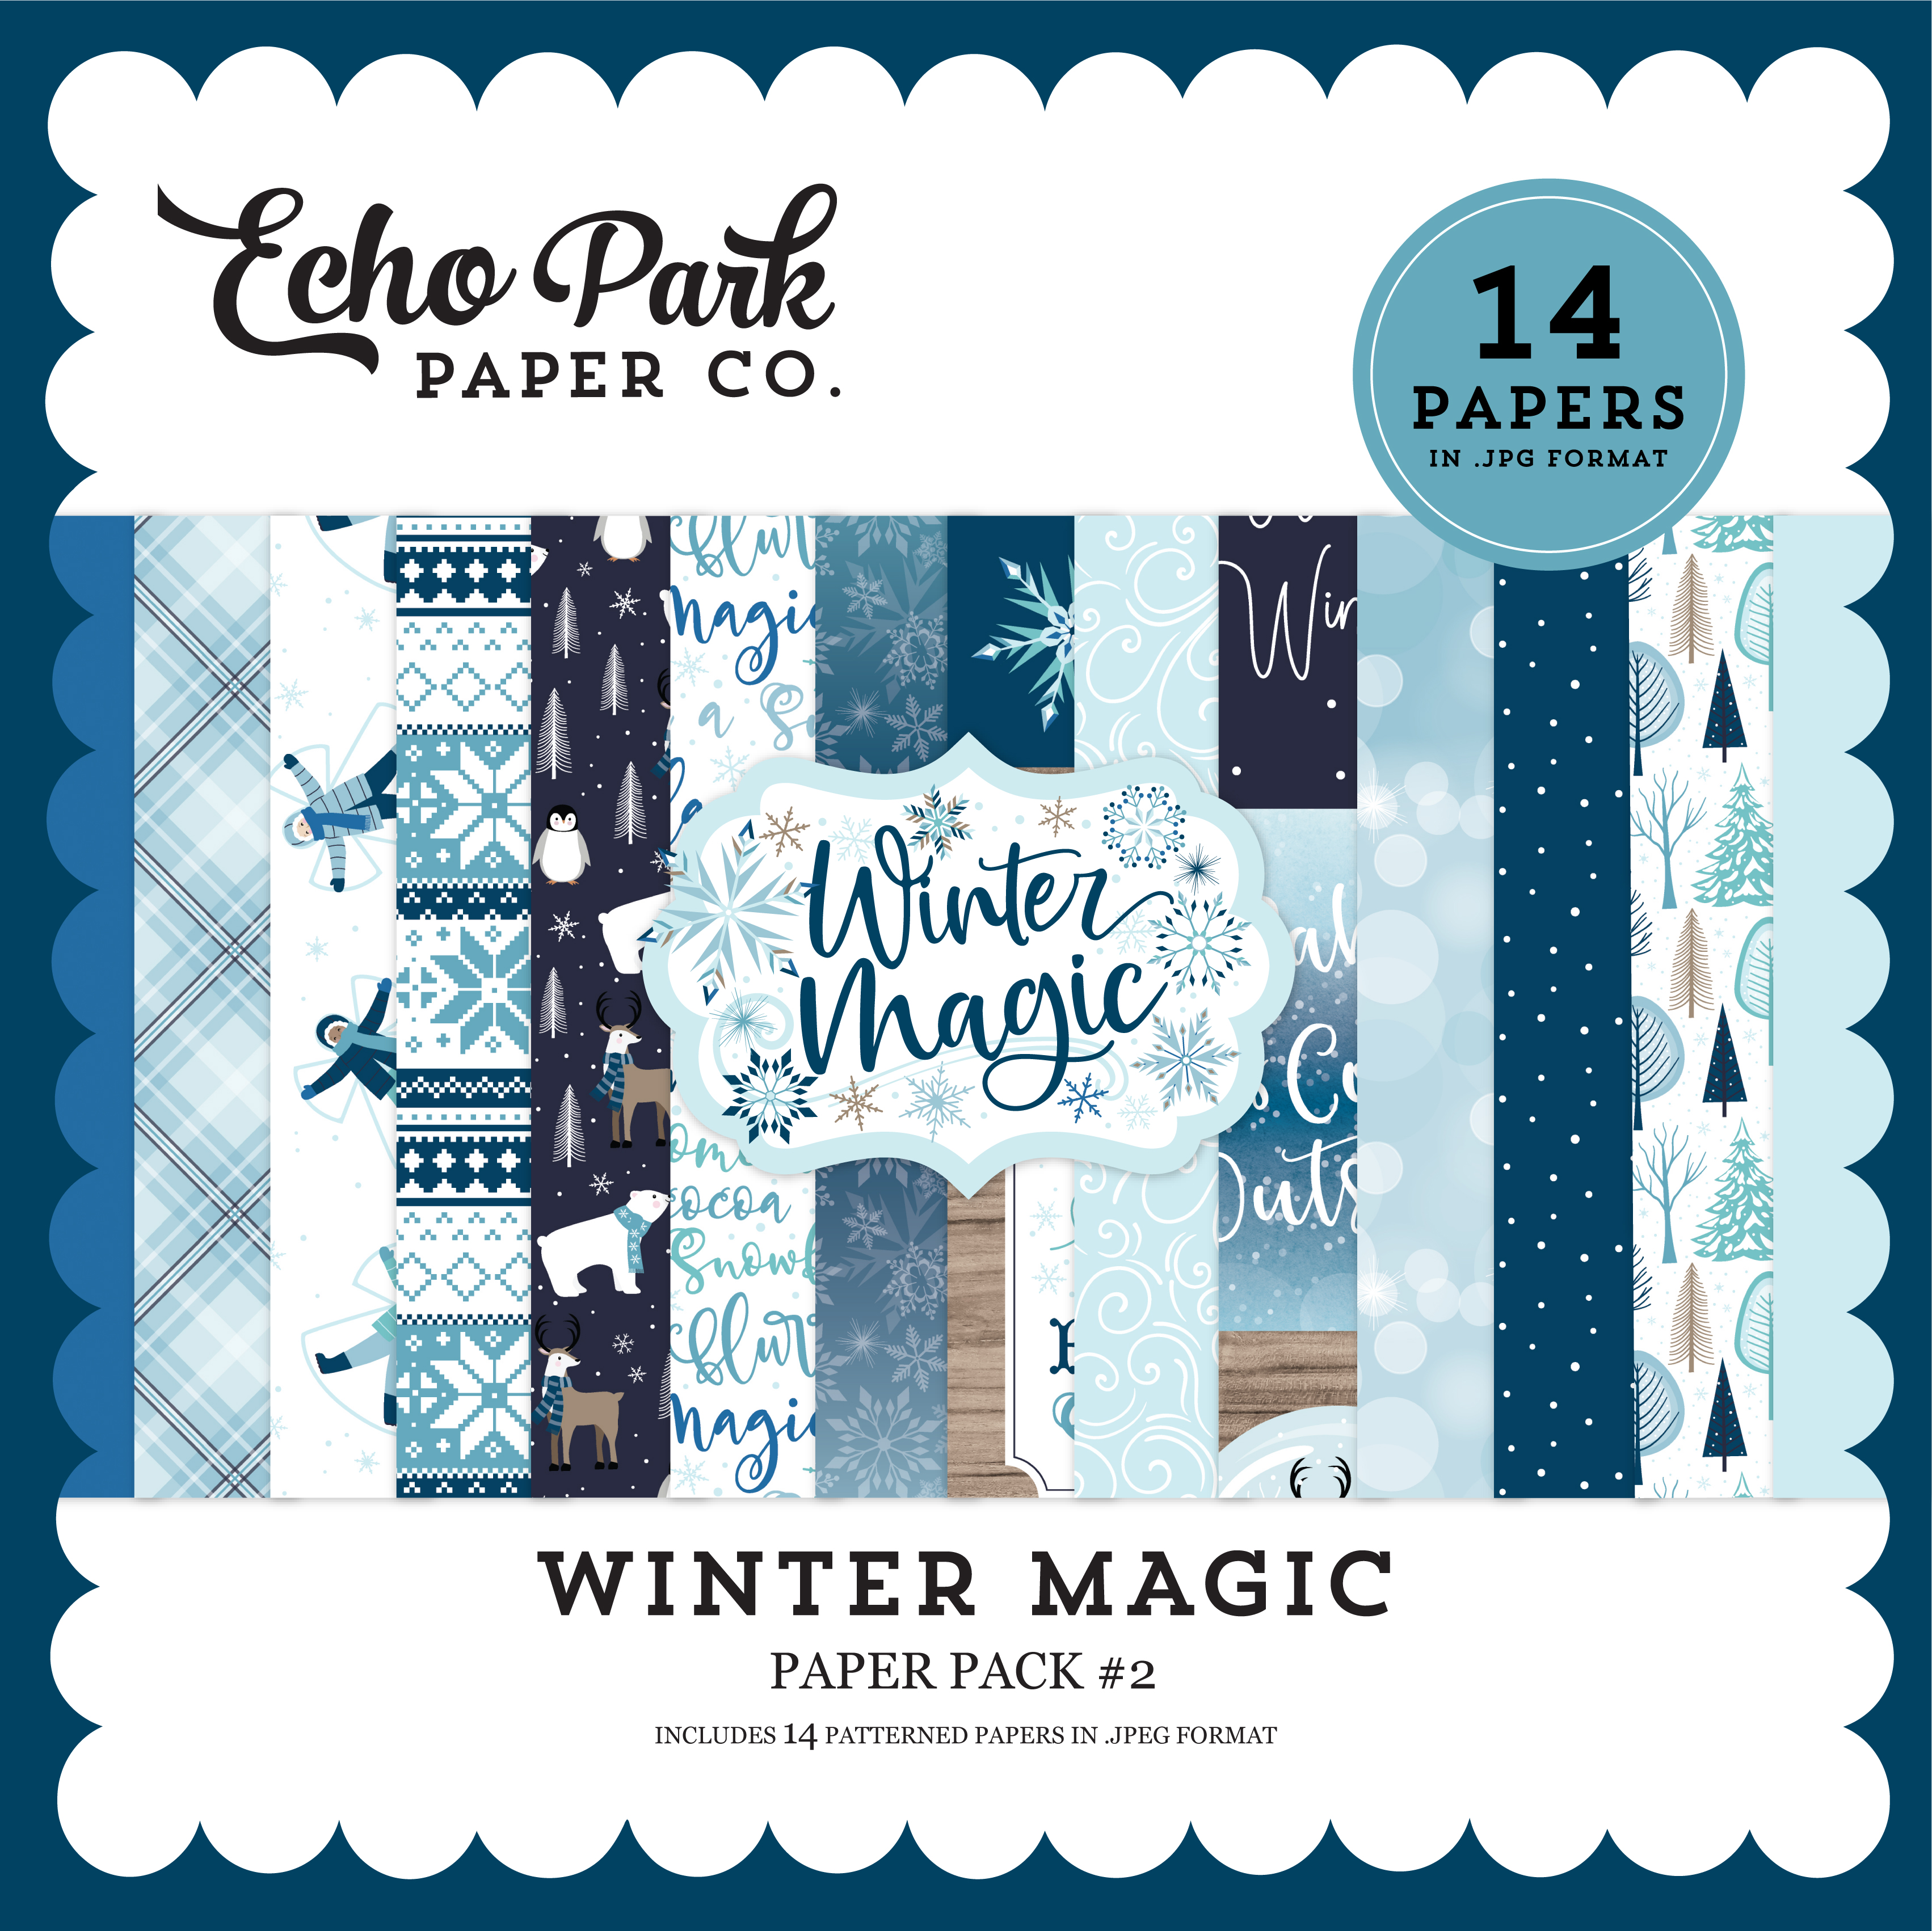 Winter Magic Paper Pack #2